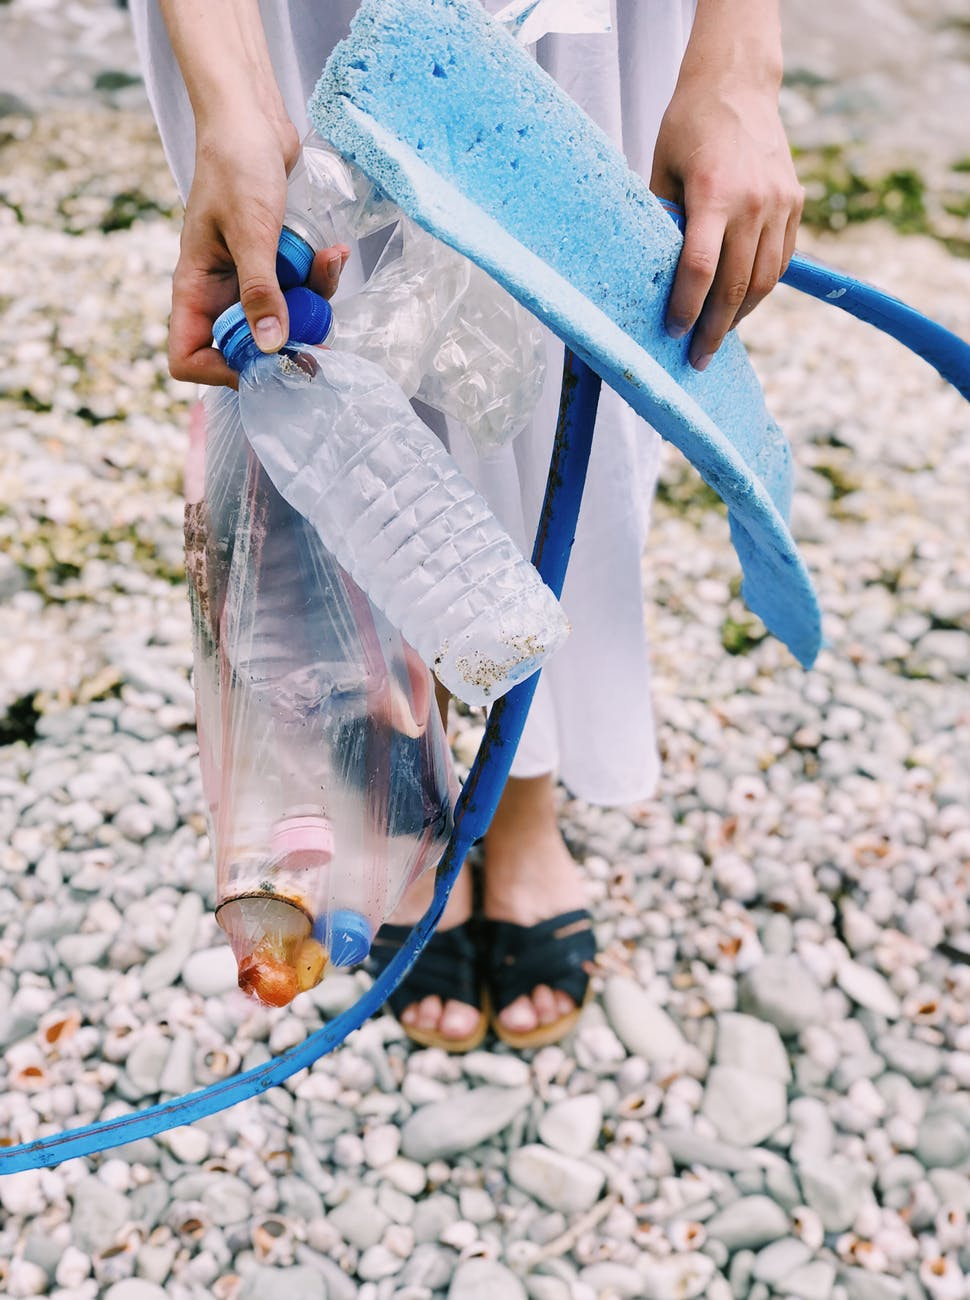 Reducing Plastic | Coacto Year of Change #9